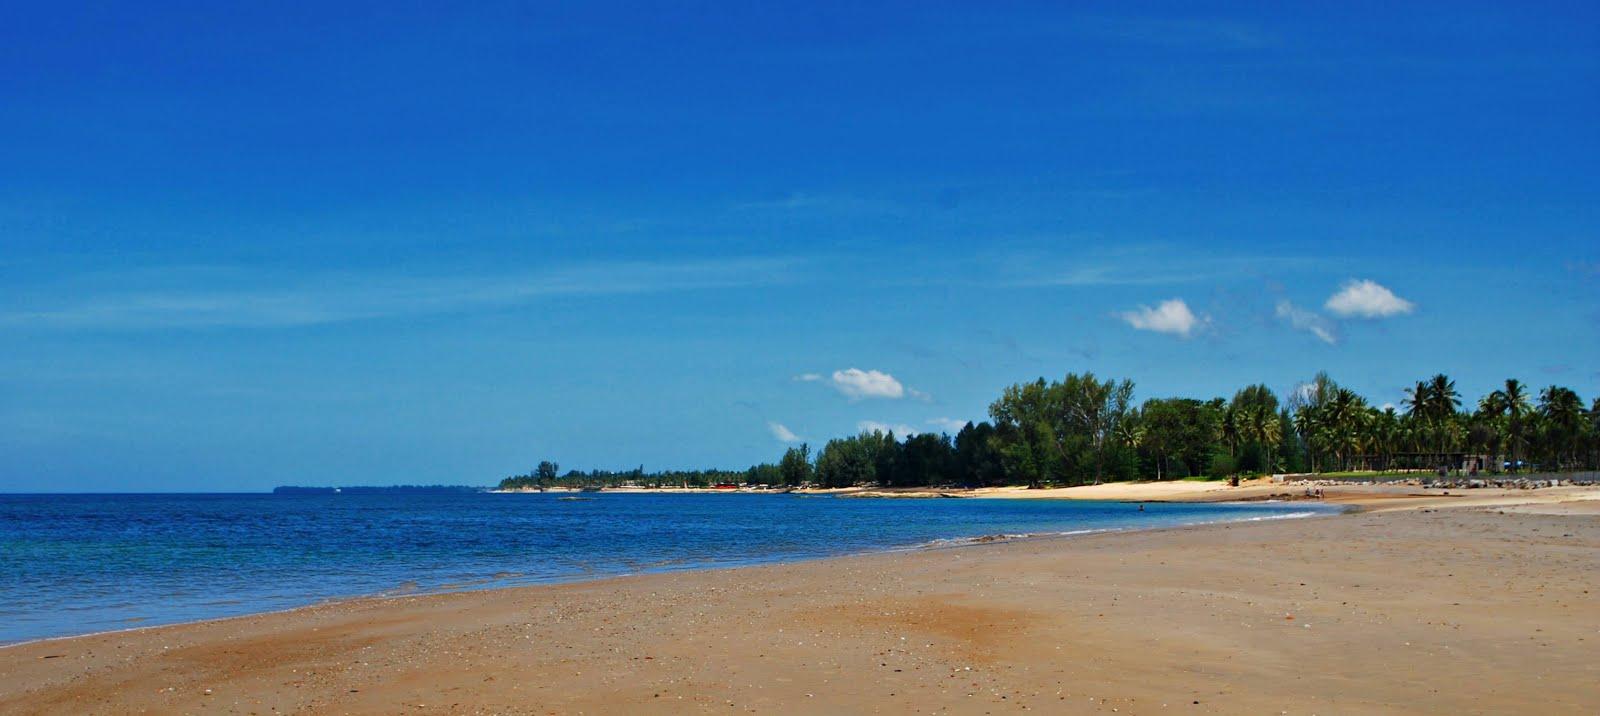 Paradiset på jorden. Khao Lak.